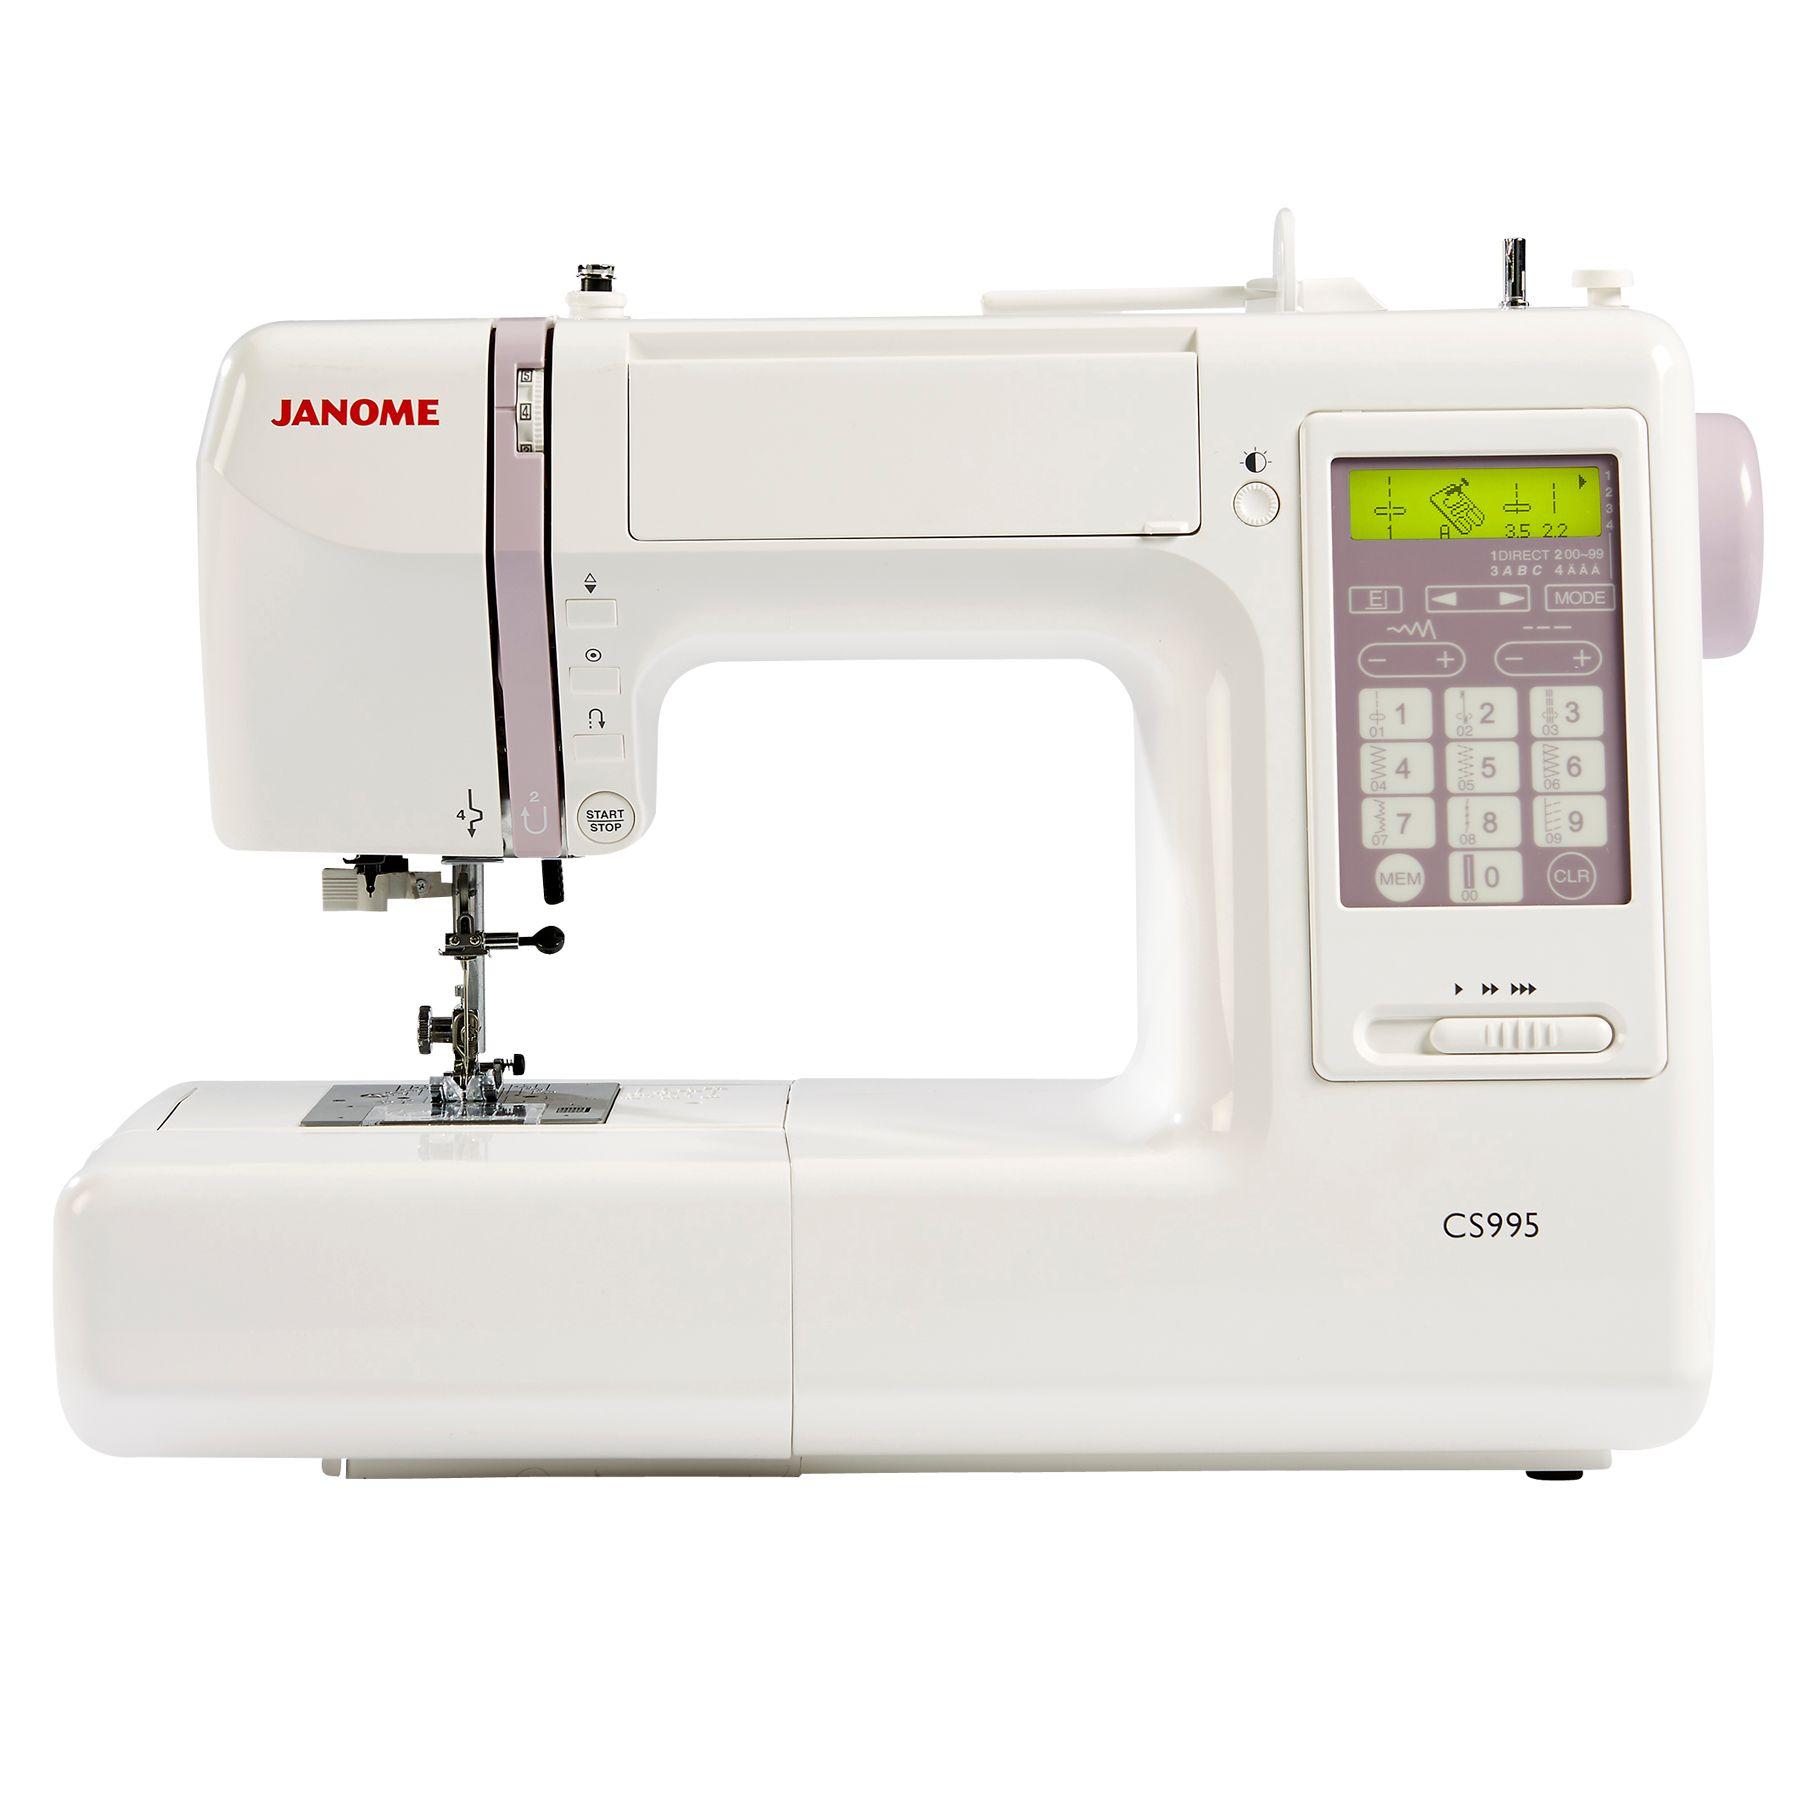 Janome Janome CS995 Computerised Sewing Machine, White